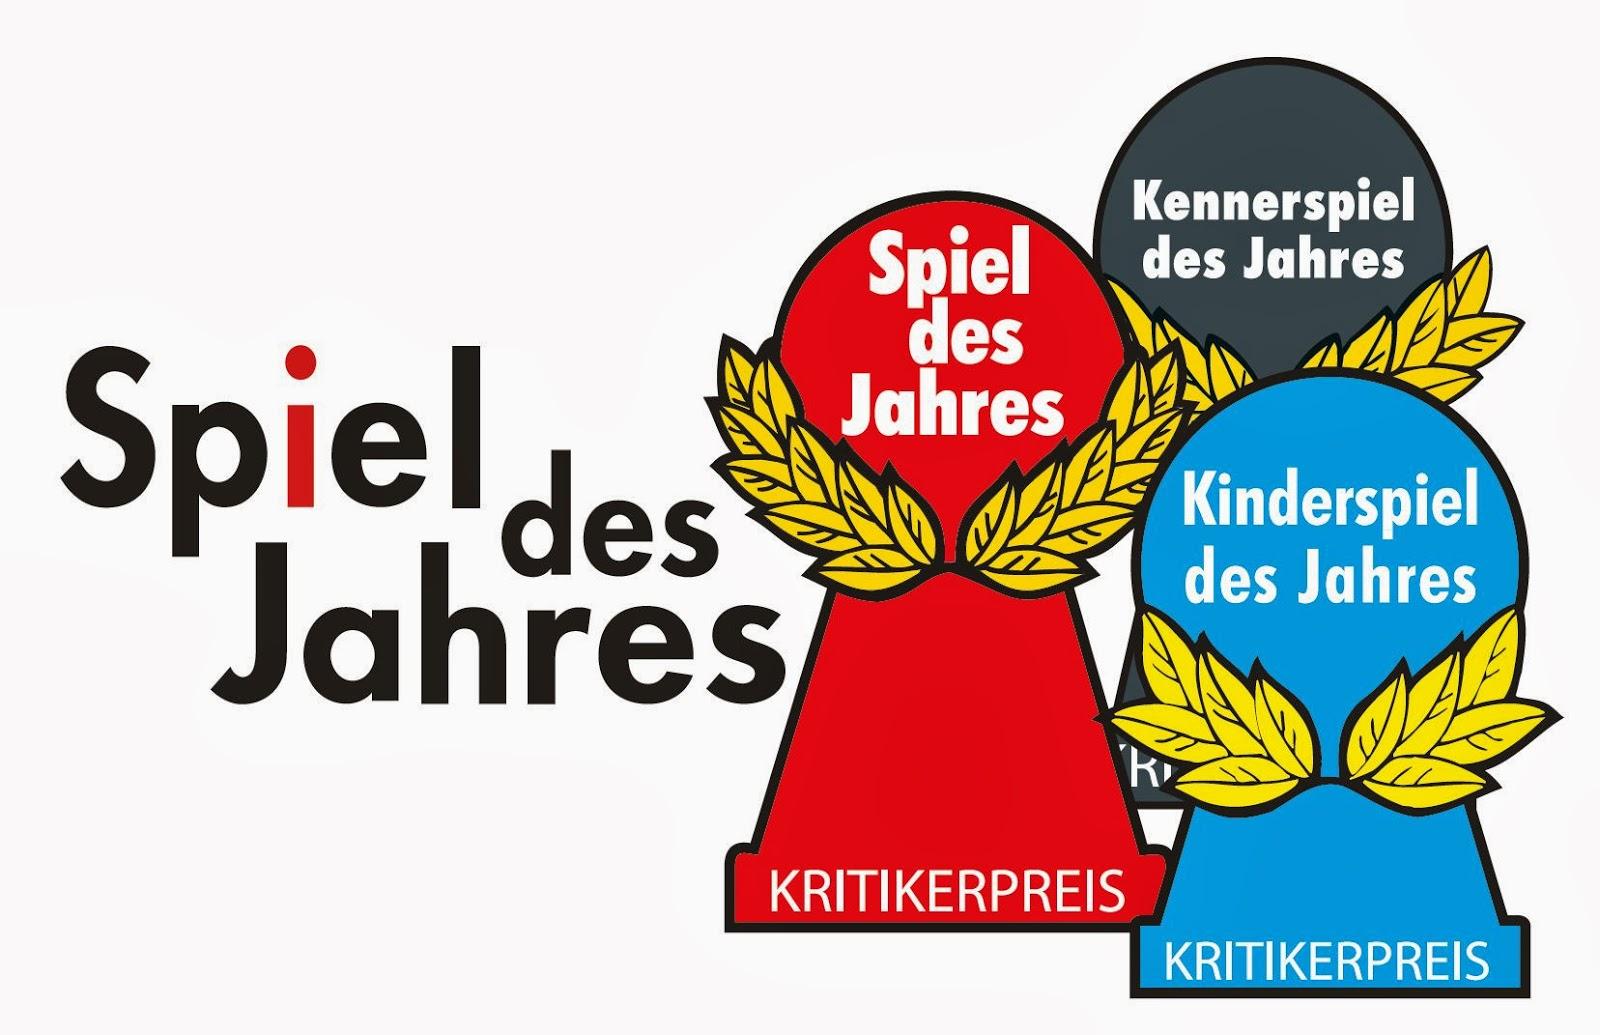 Image from www.spiel-des-jahres.com